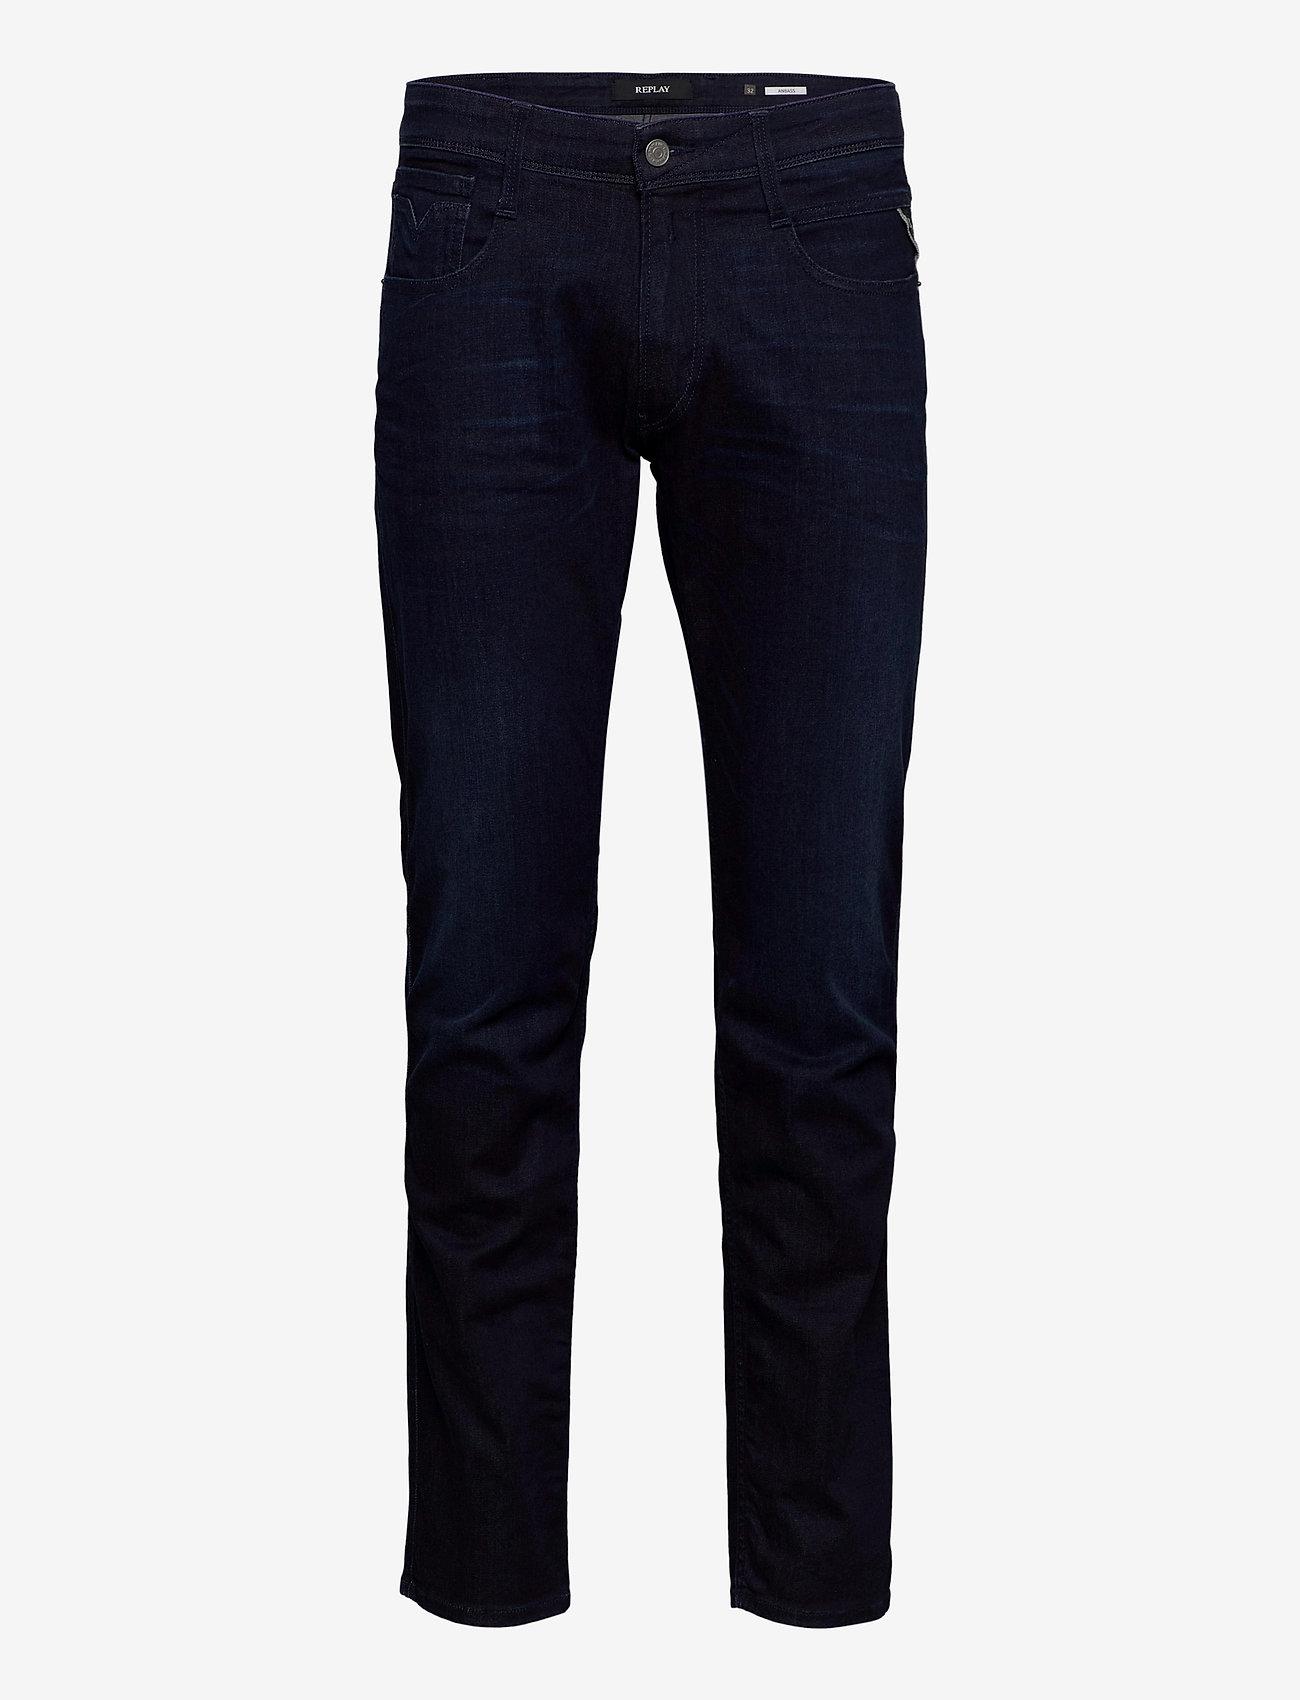 Replay - ANBASS - slim jeans - dark blue - 0